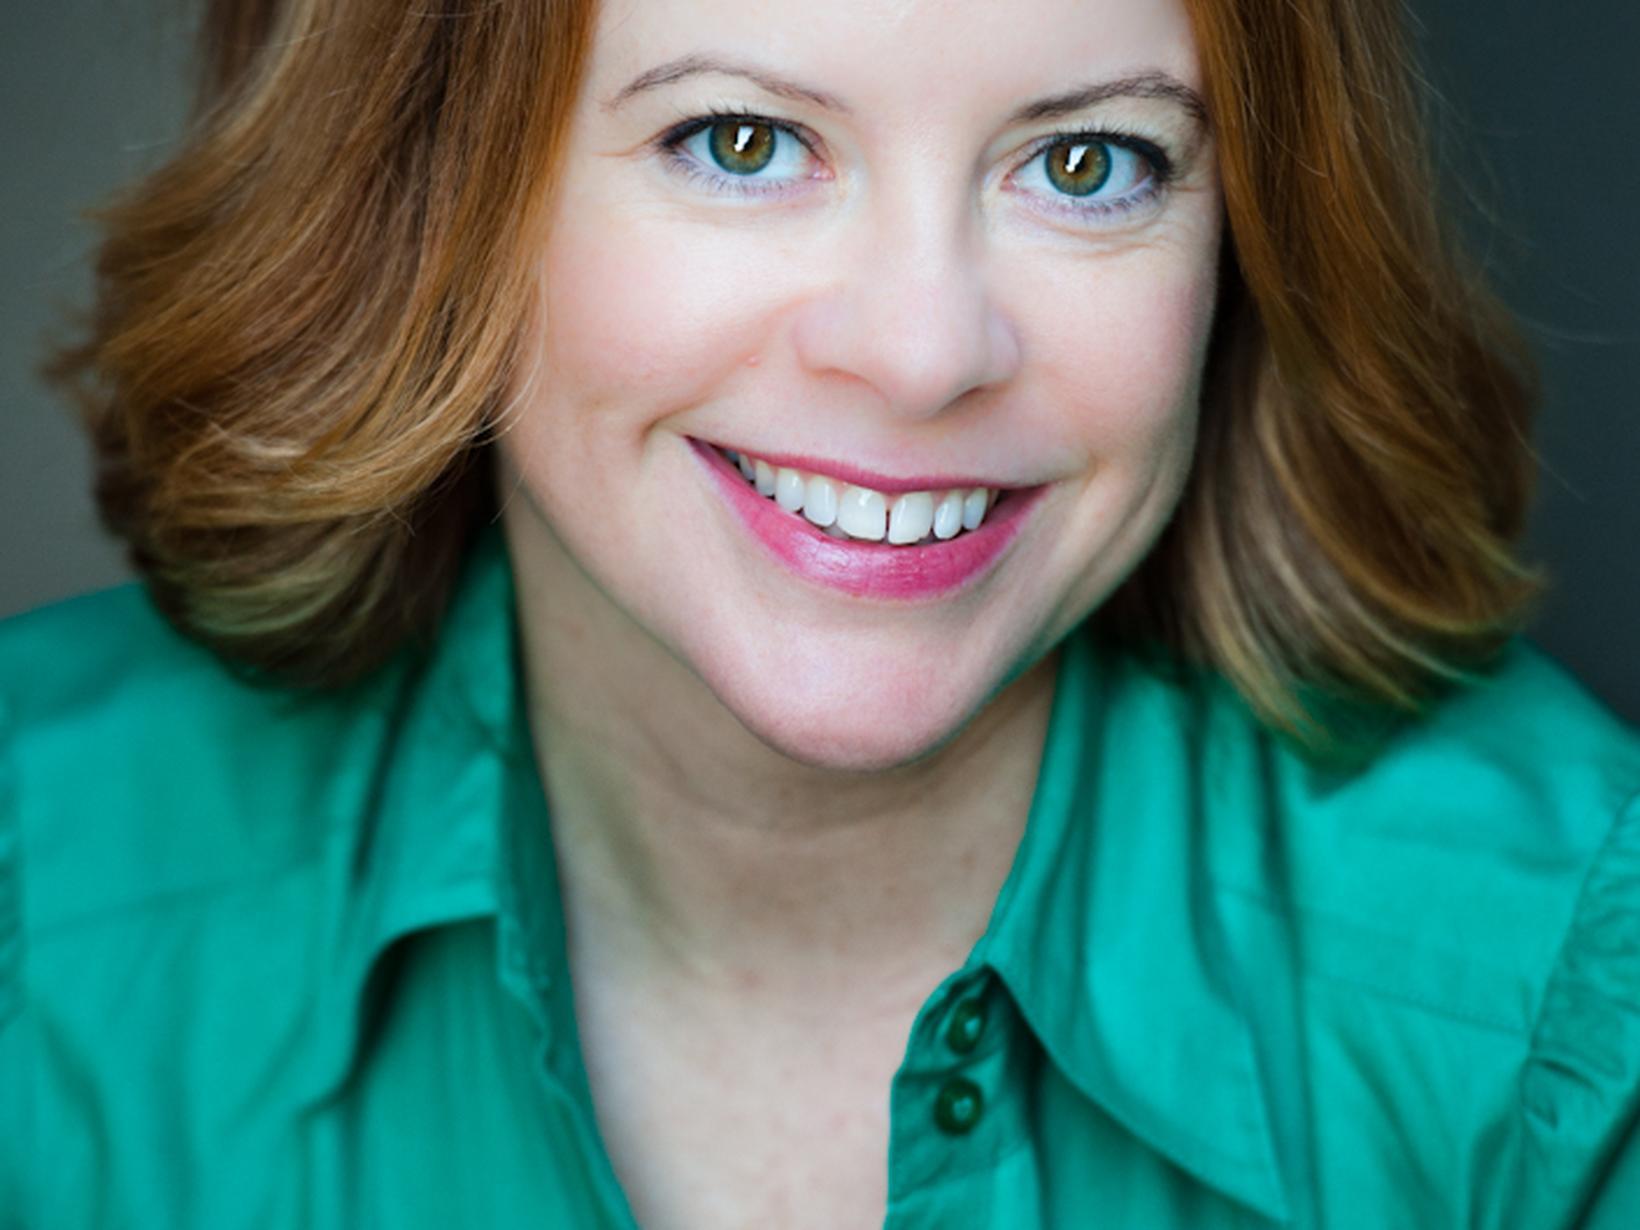 Heidi b from Los Angeles, California, United States